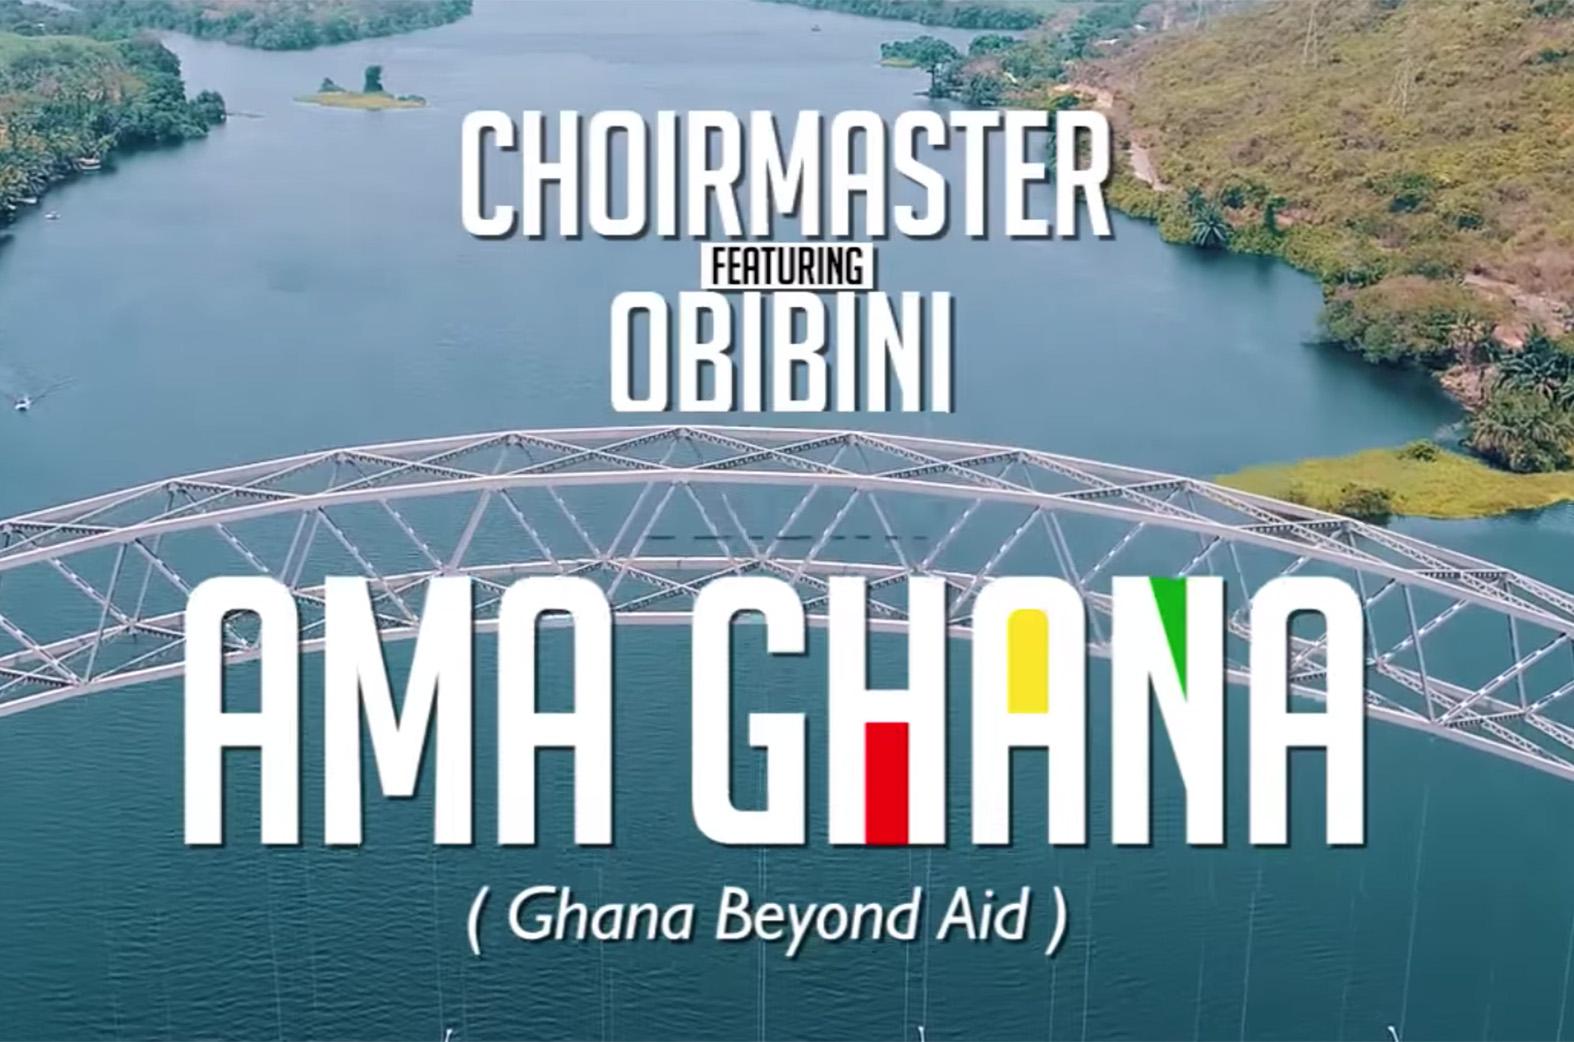 Ama Ghana by Choir Master feat. Obibini